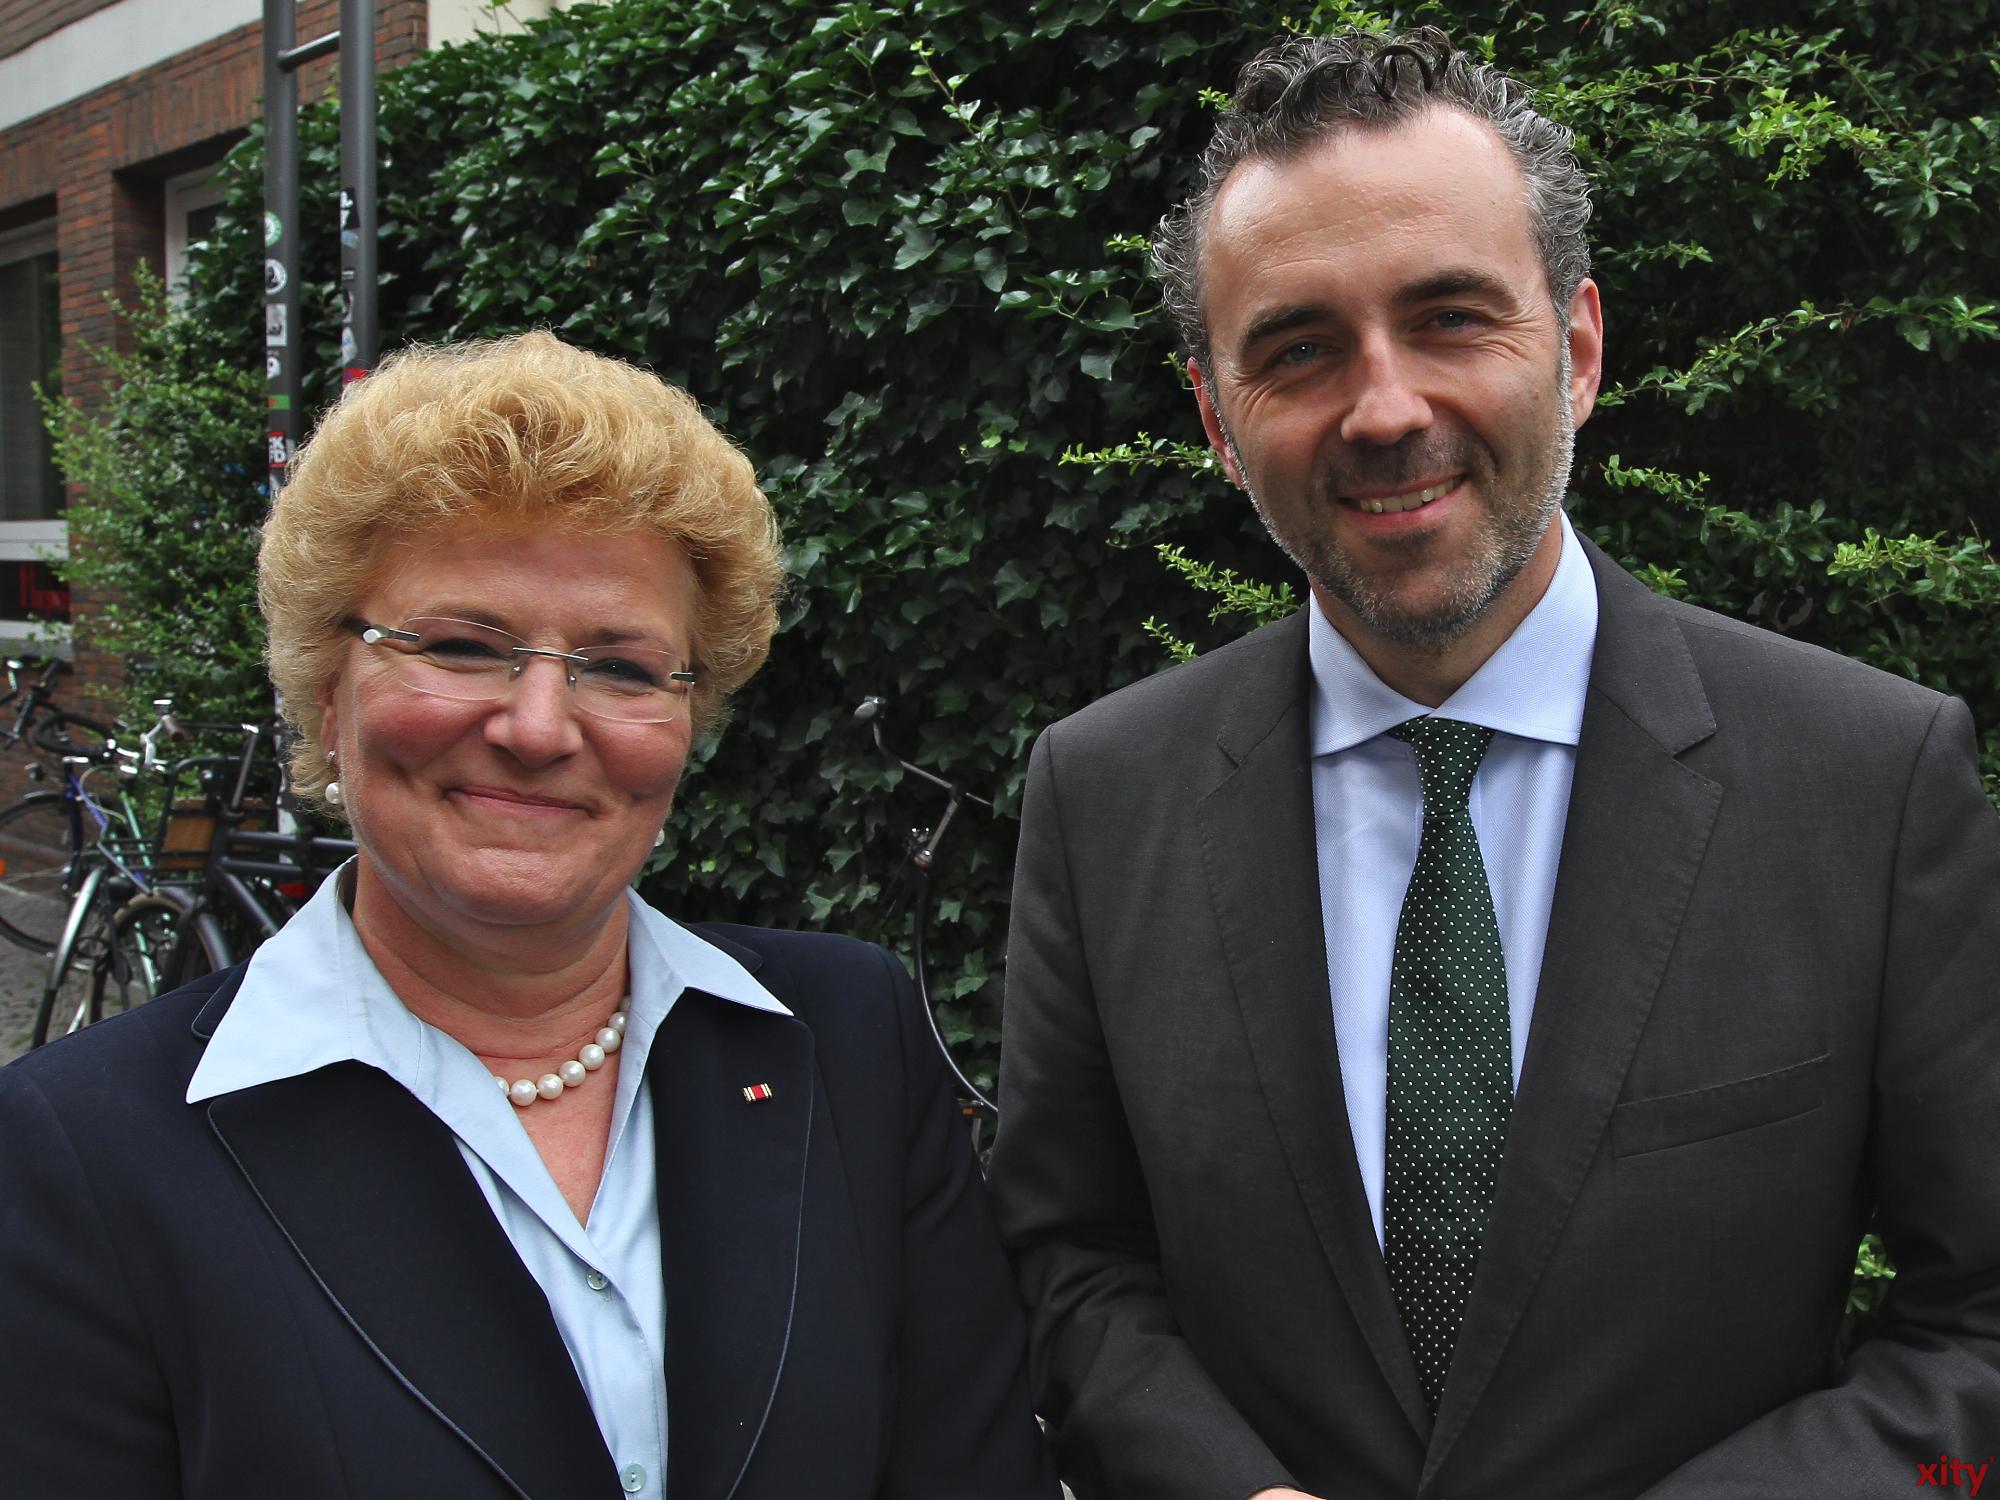 Für die Bundestagswahl nominiert: Silvia Pantel und Thomas Jarzombek (Foto: xity)